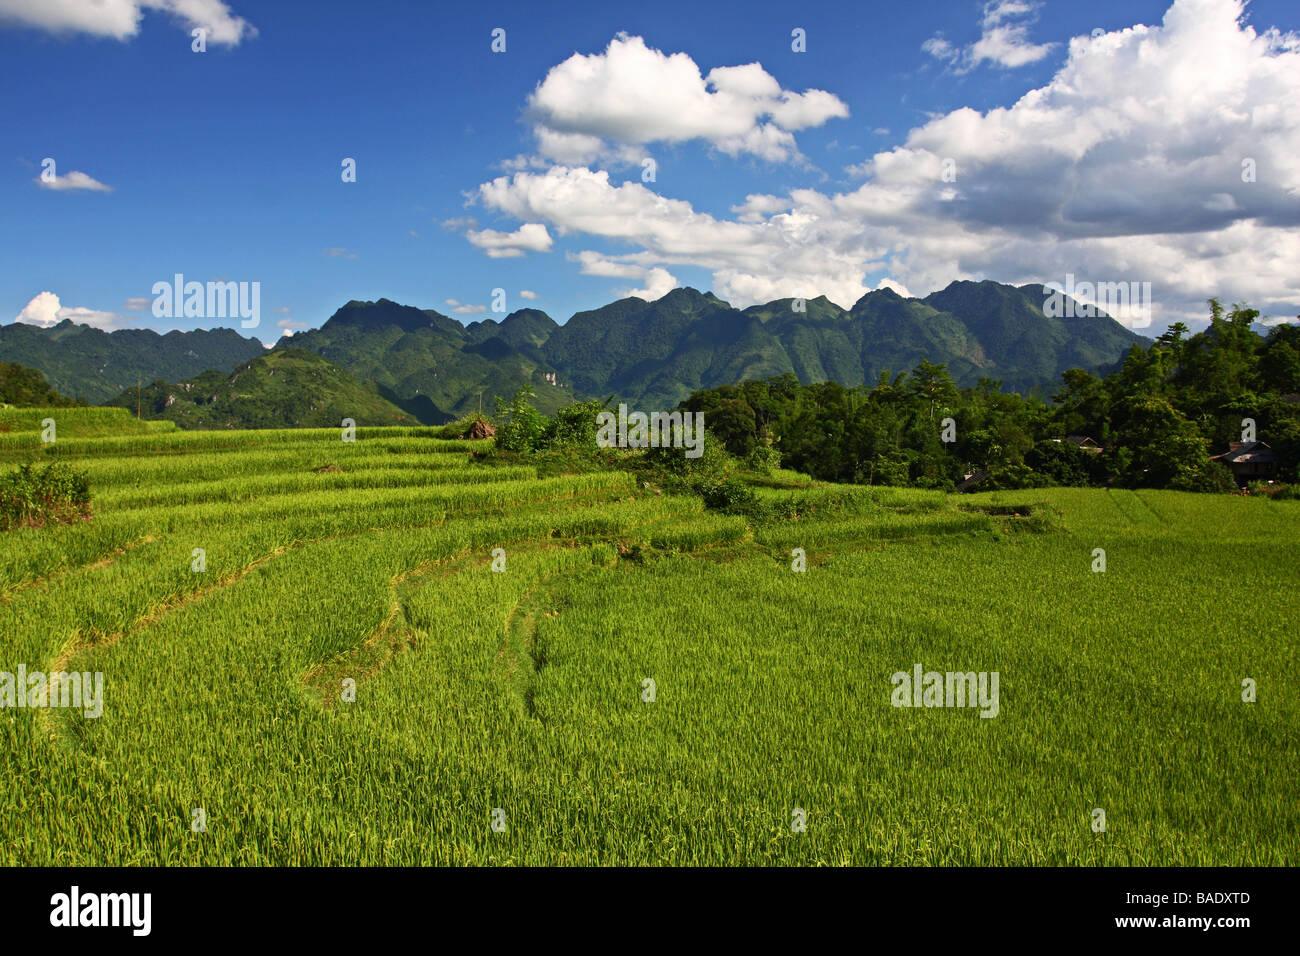 Beautiful landscape with green mountains and rice fileds around Mai Chau minority village. Vietnam - Stock Image